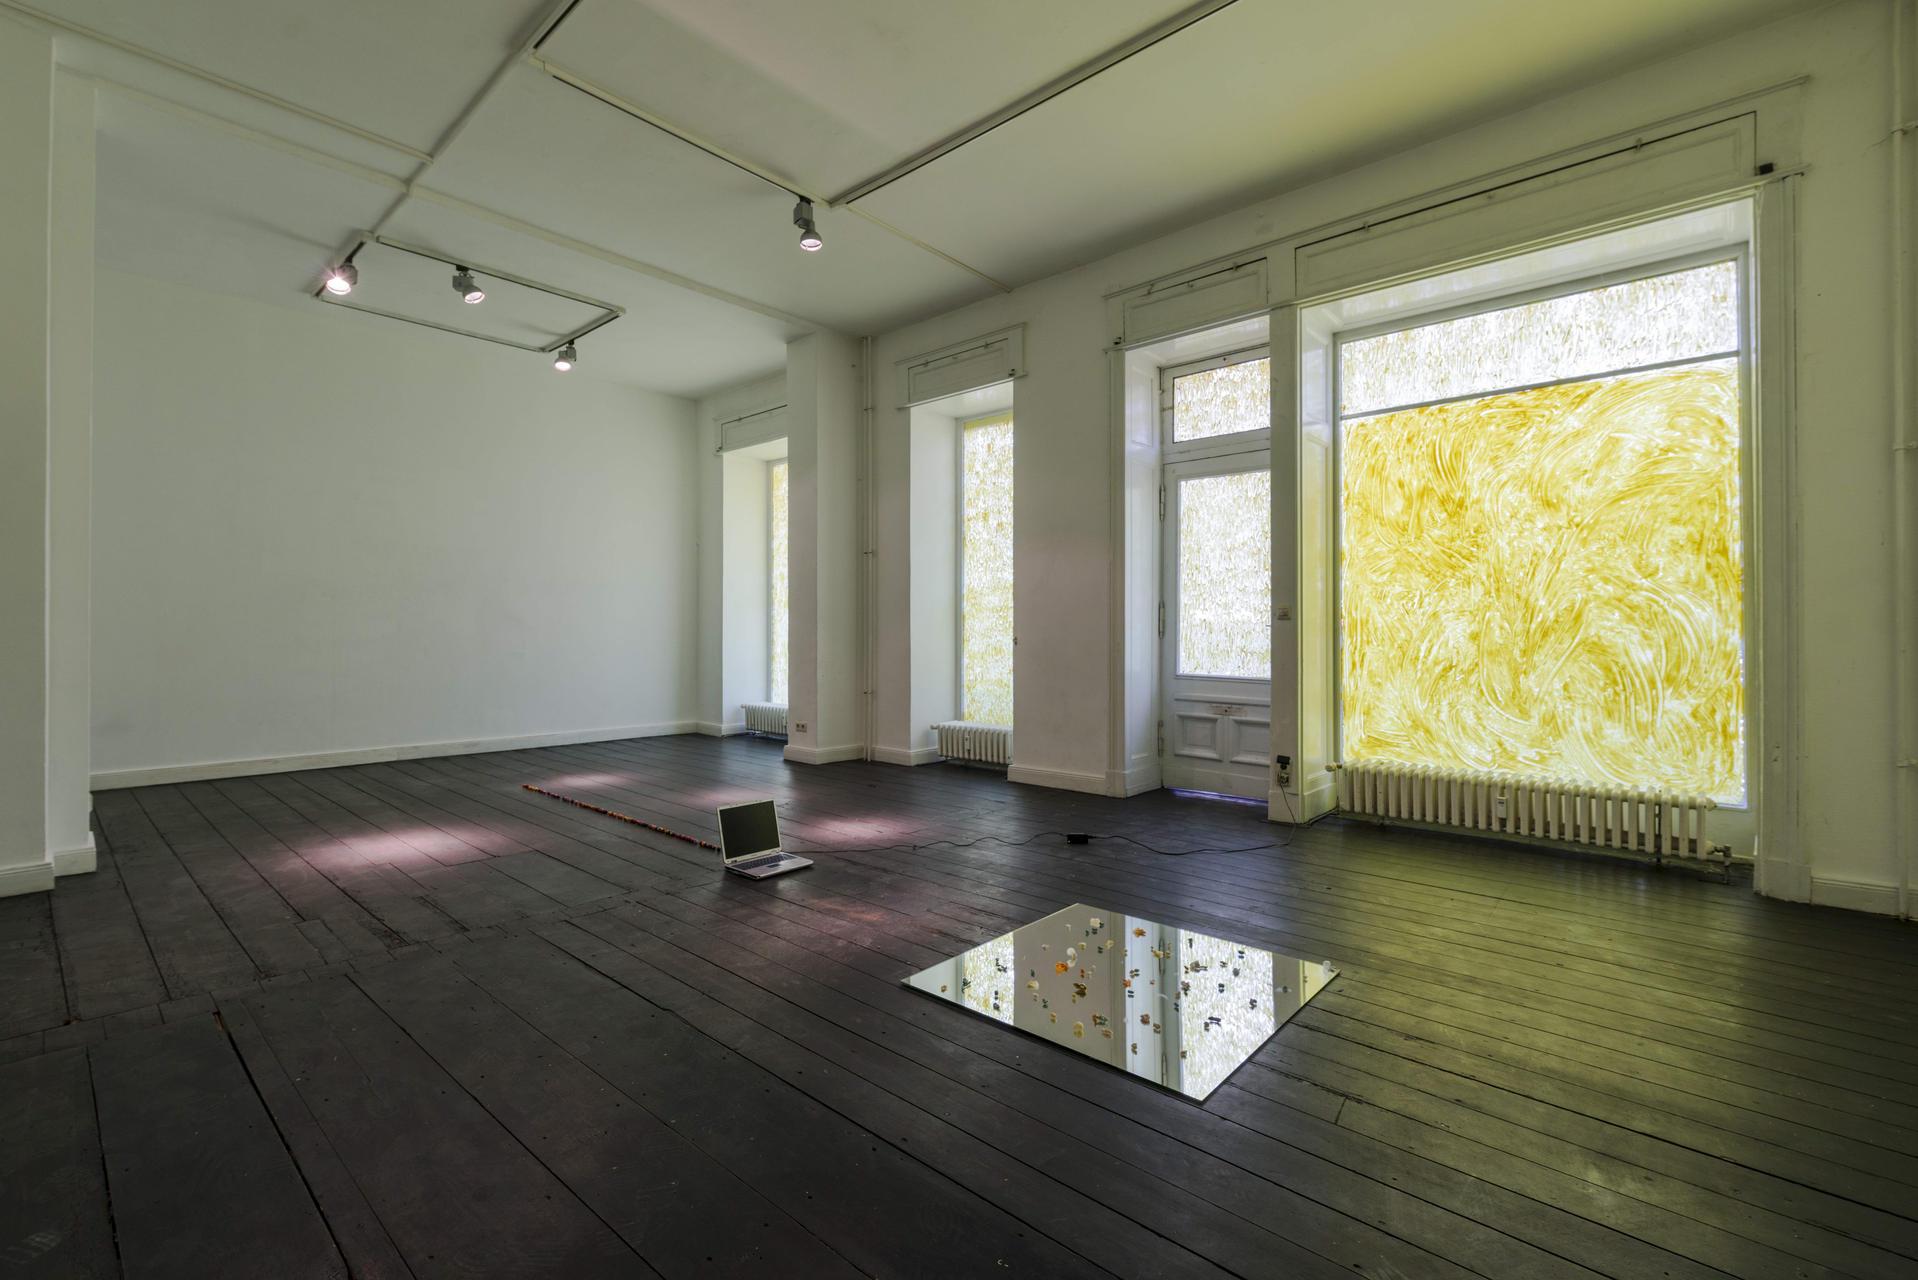 TGood TSJO¦êRBERG artdoc Grimmuseum 27 02 2015 _0130